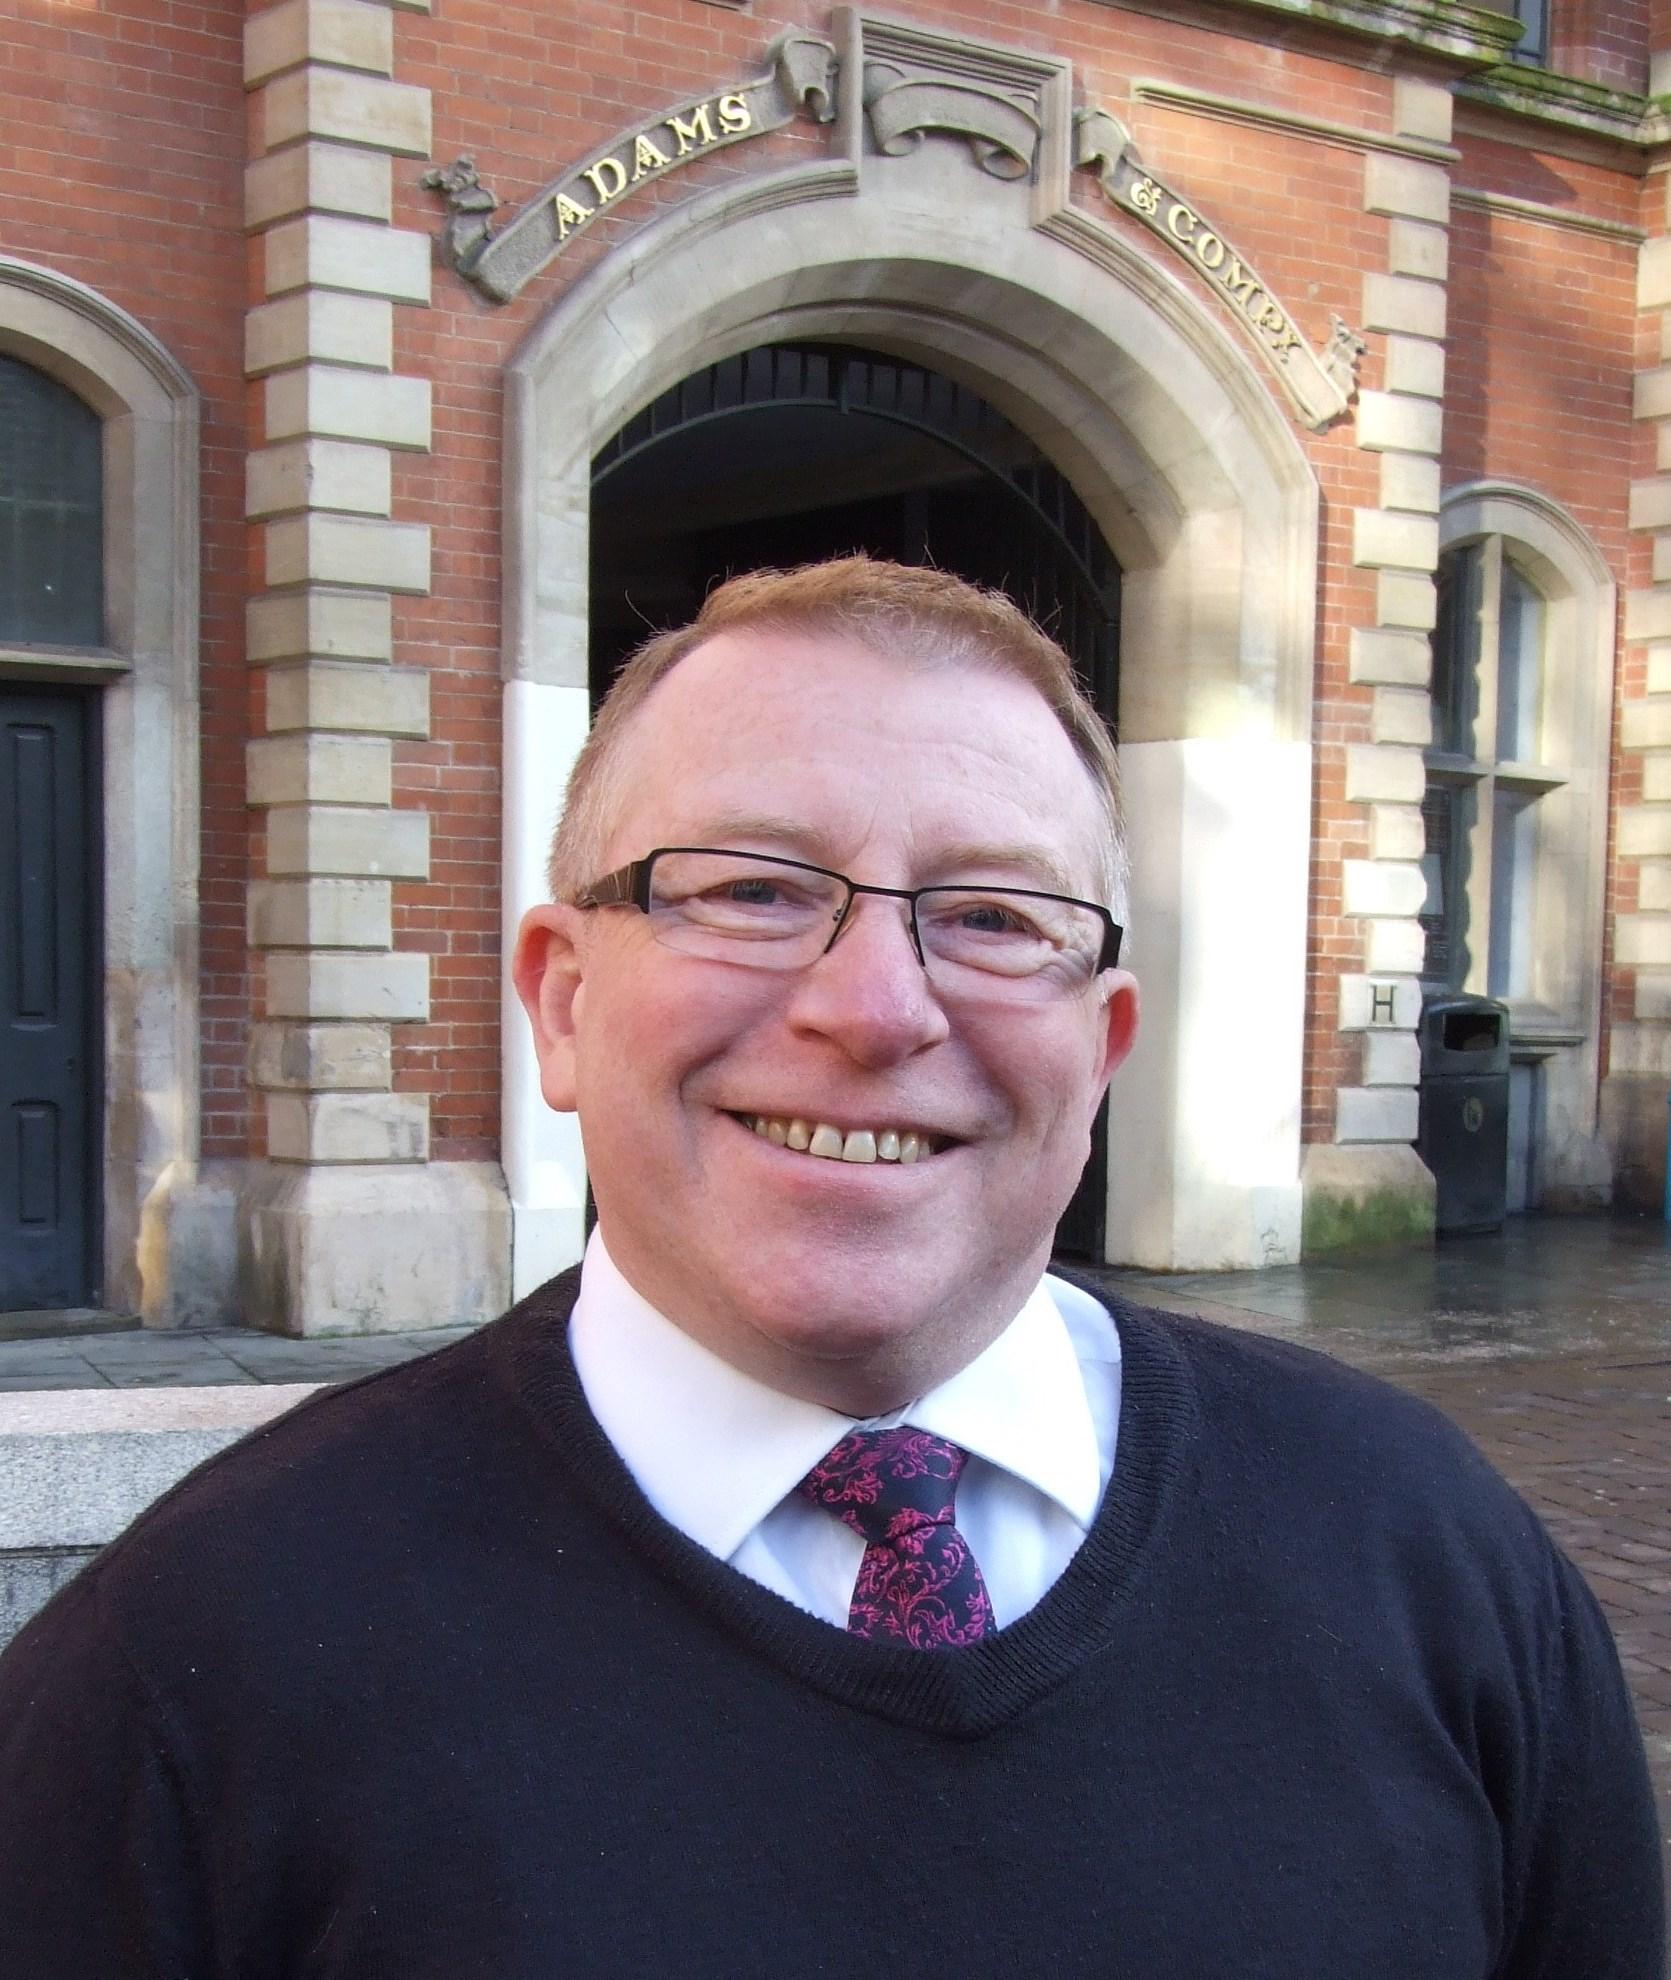 Phil Tomlinson